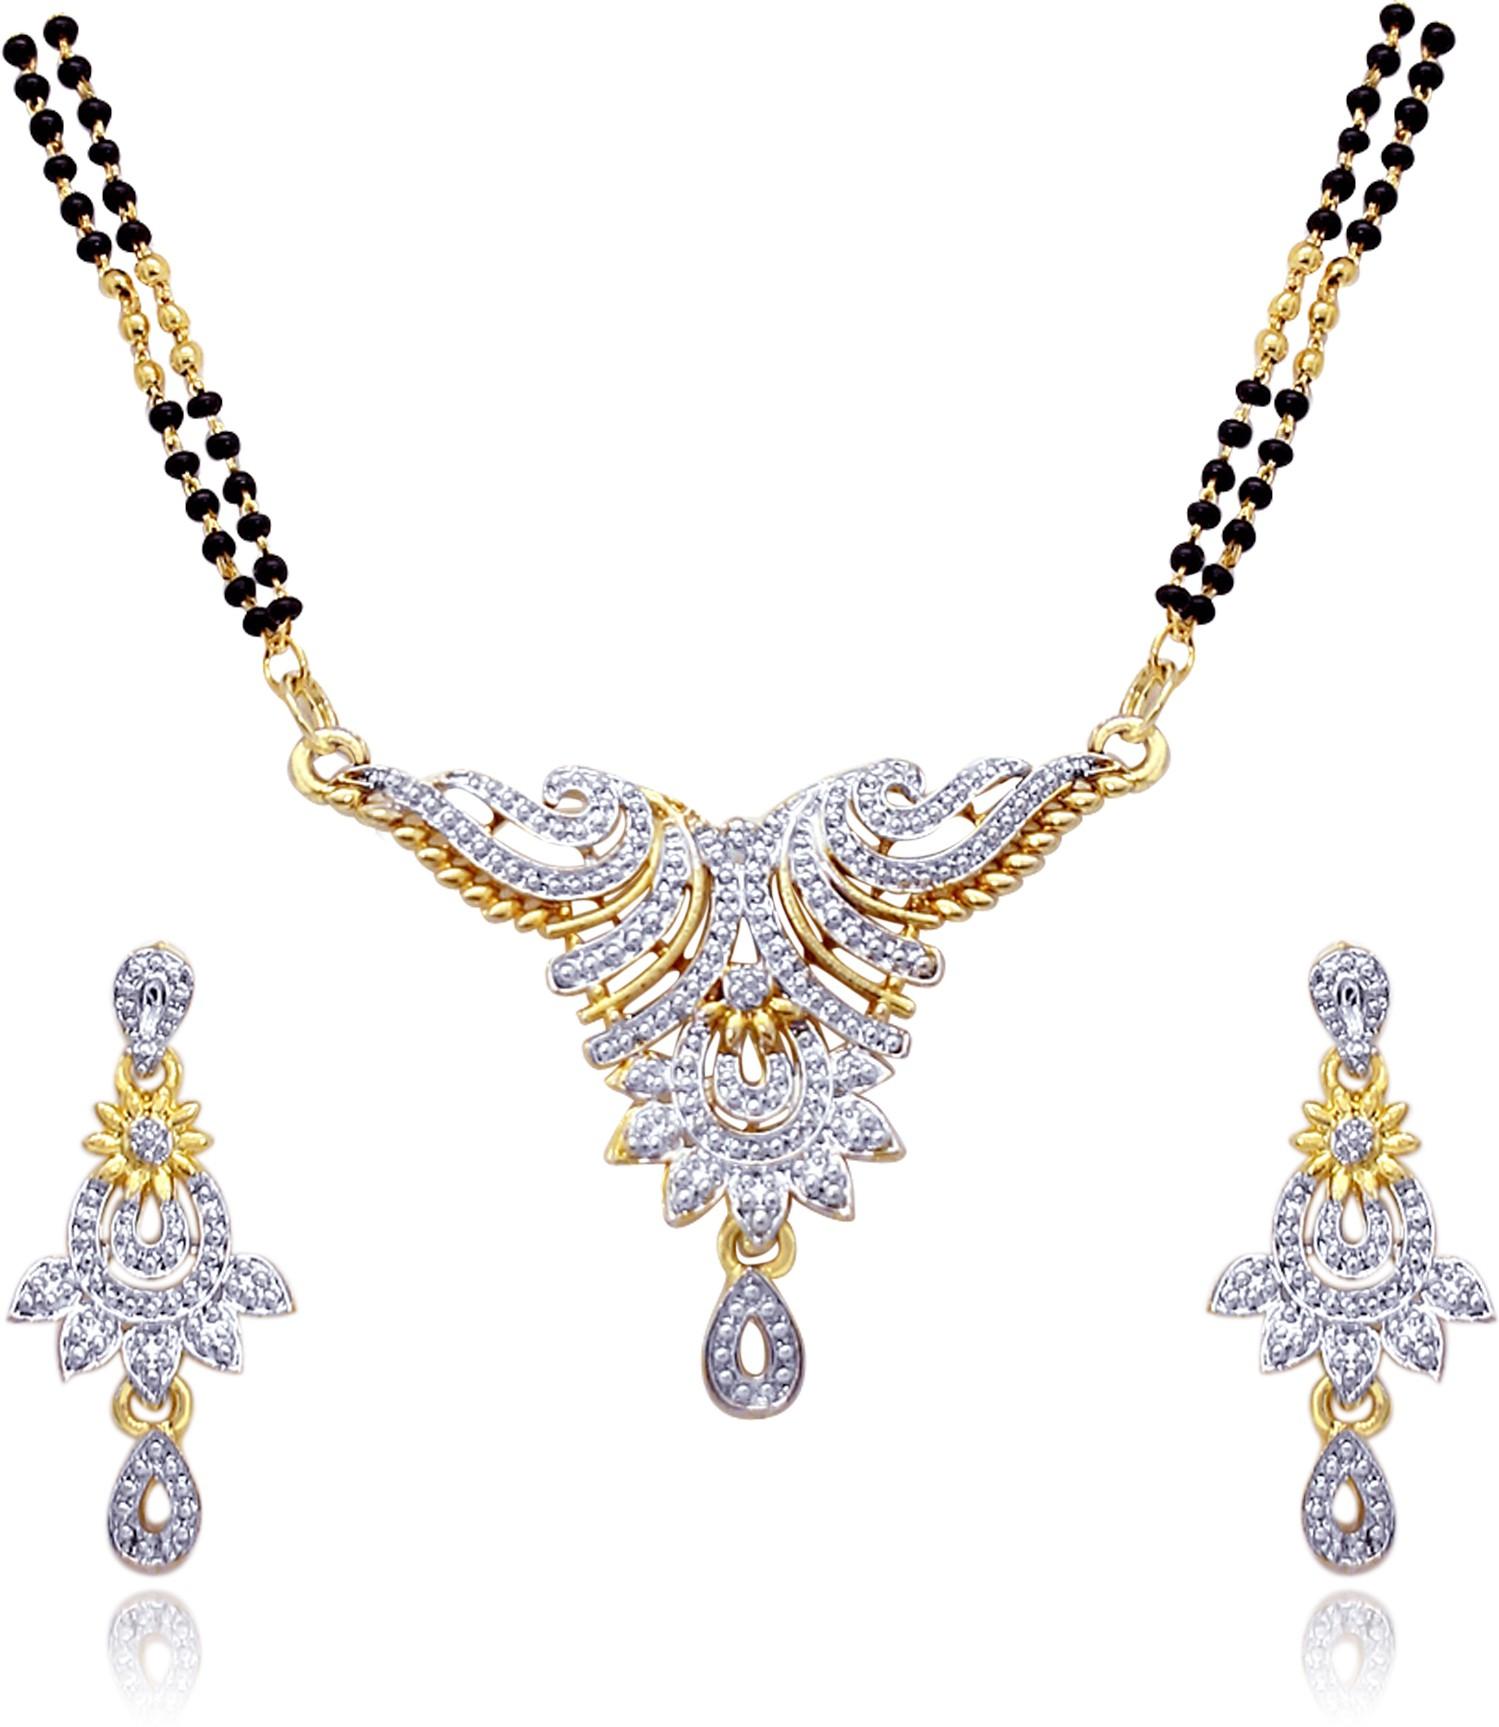 Deals - Delhi - Under Rs.499 <br> Rings, Pendants...<br> Category - jewellery<br> Business - Flipkart.com